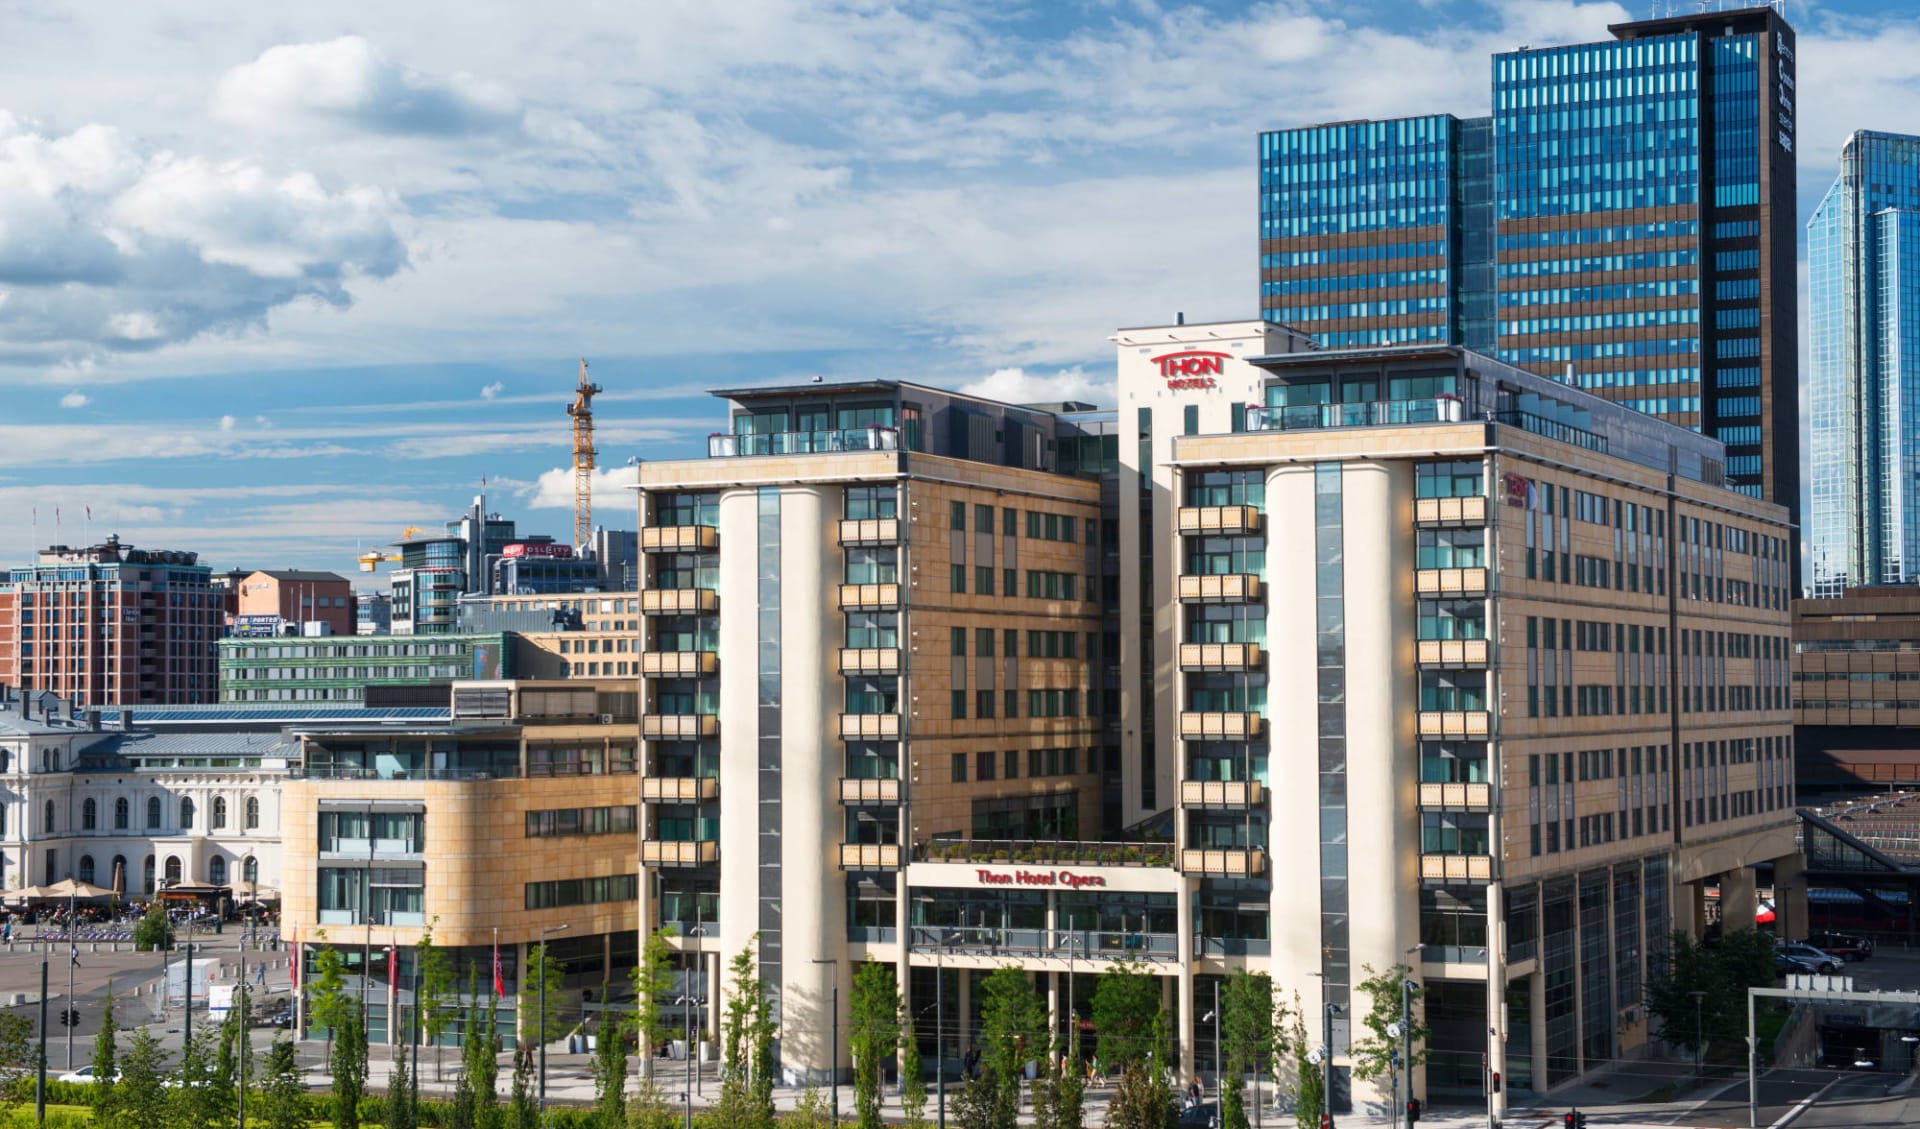 Thon Opera in Oslo: ©Thon Hotels_Fasade 1